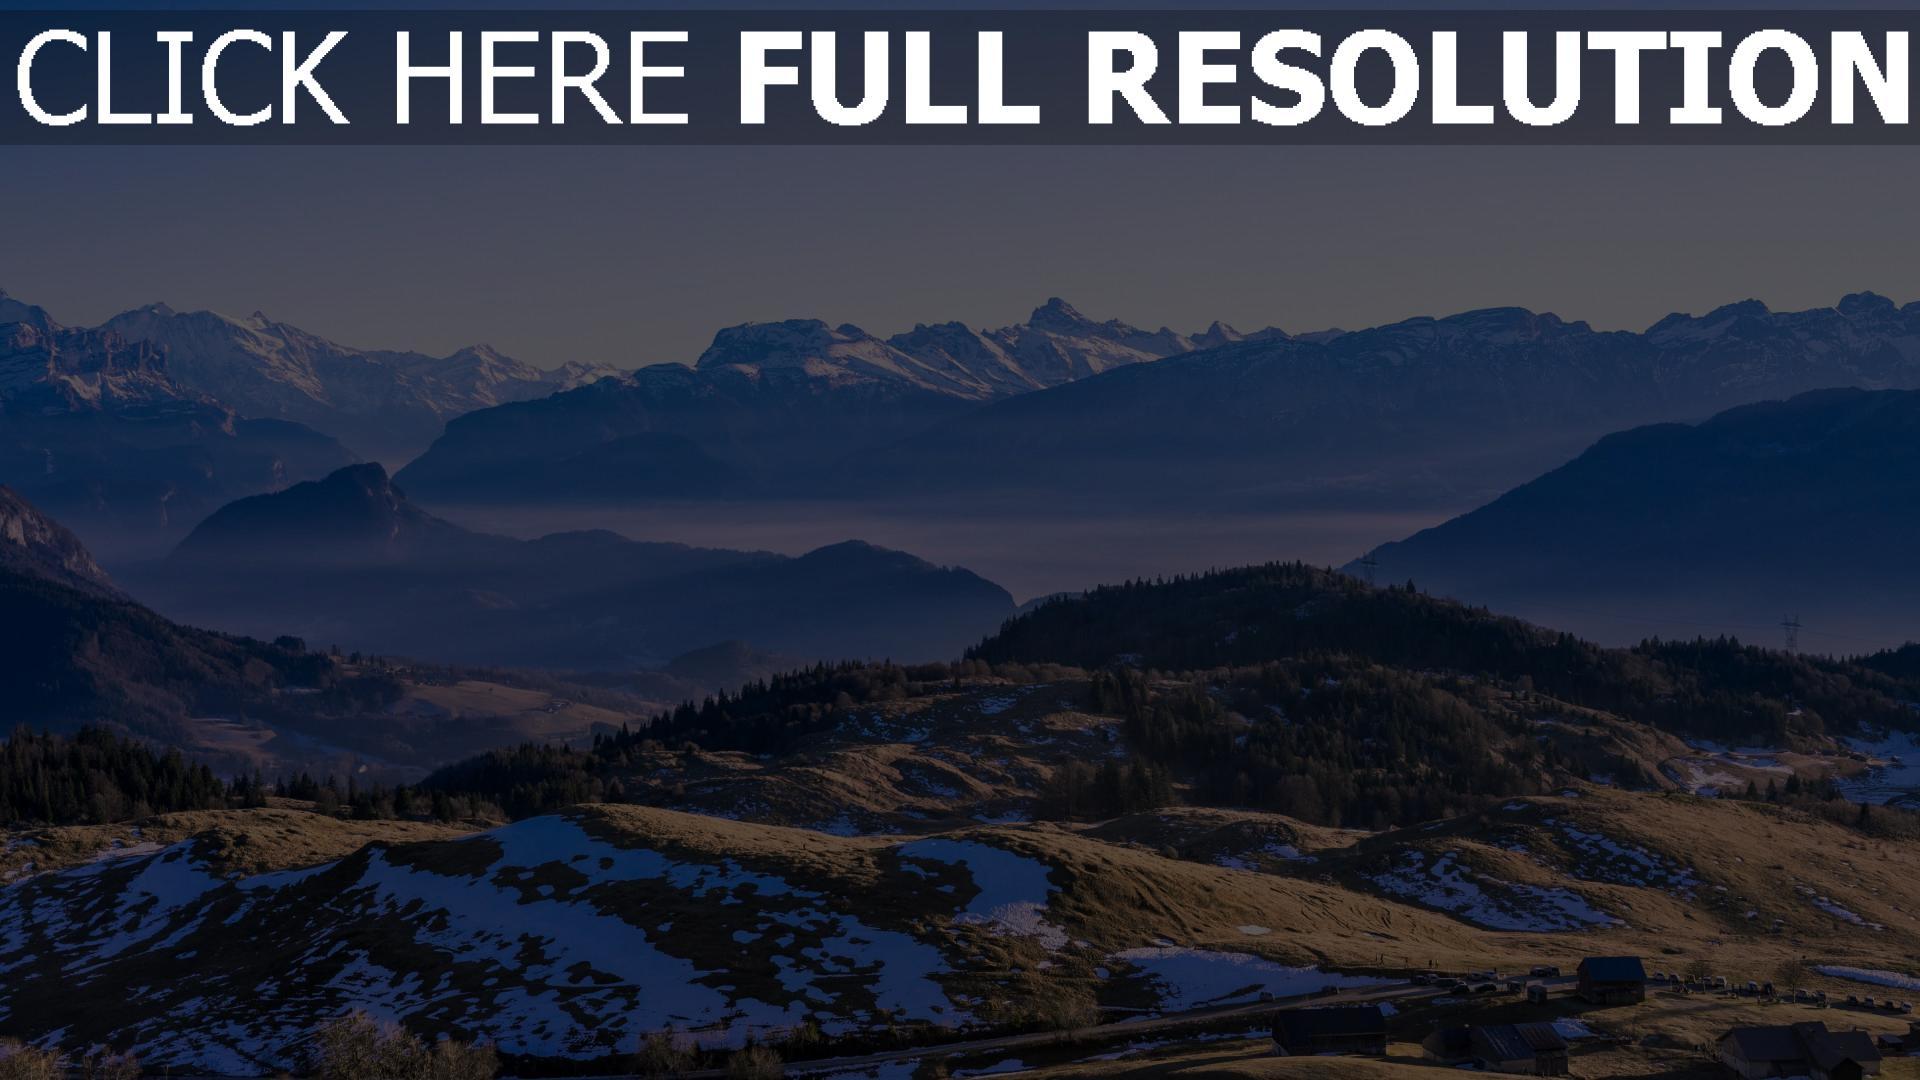 hd hintergrundbilder abstand schnee berge bäume 1920x1080